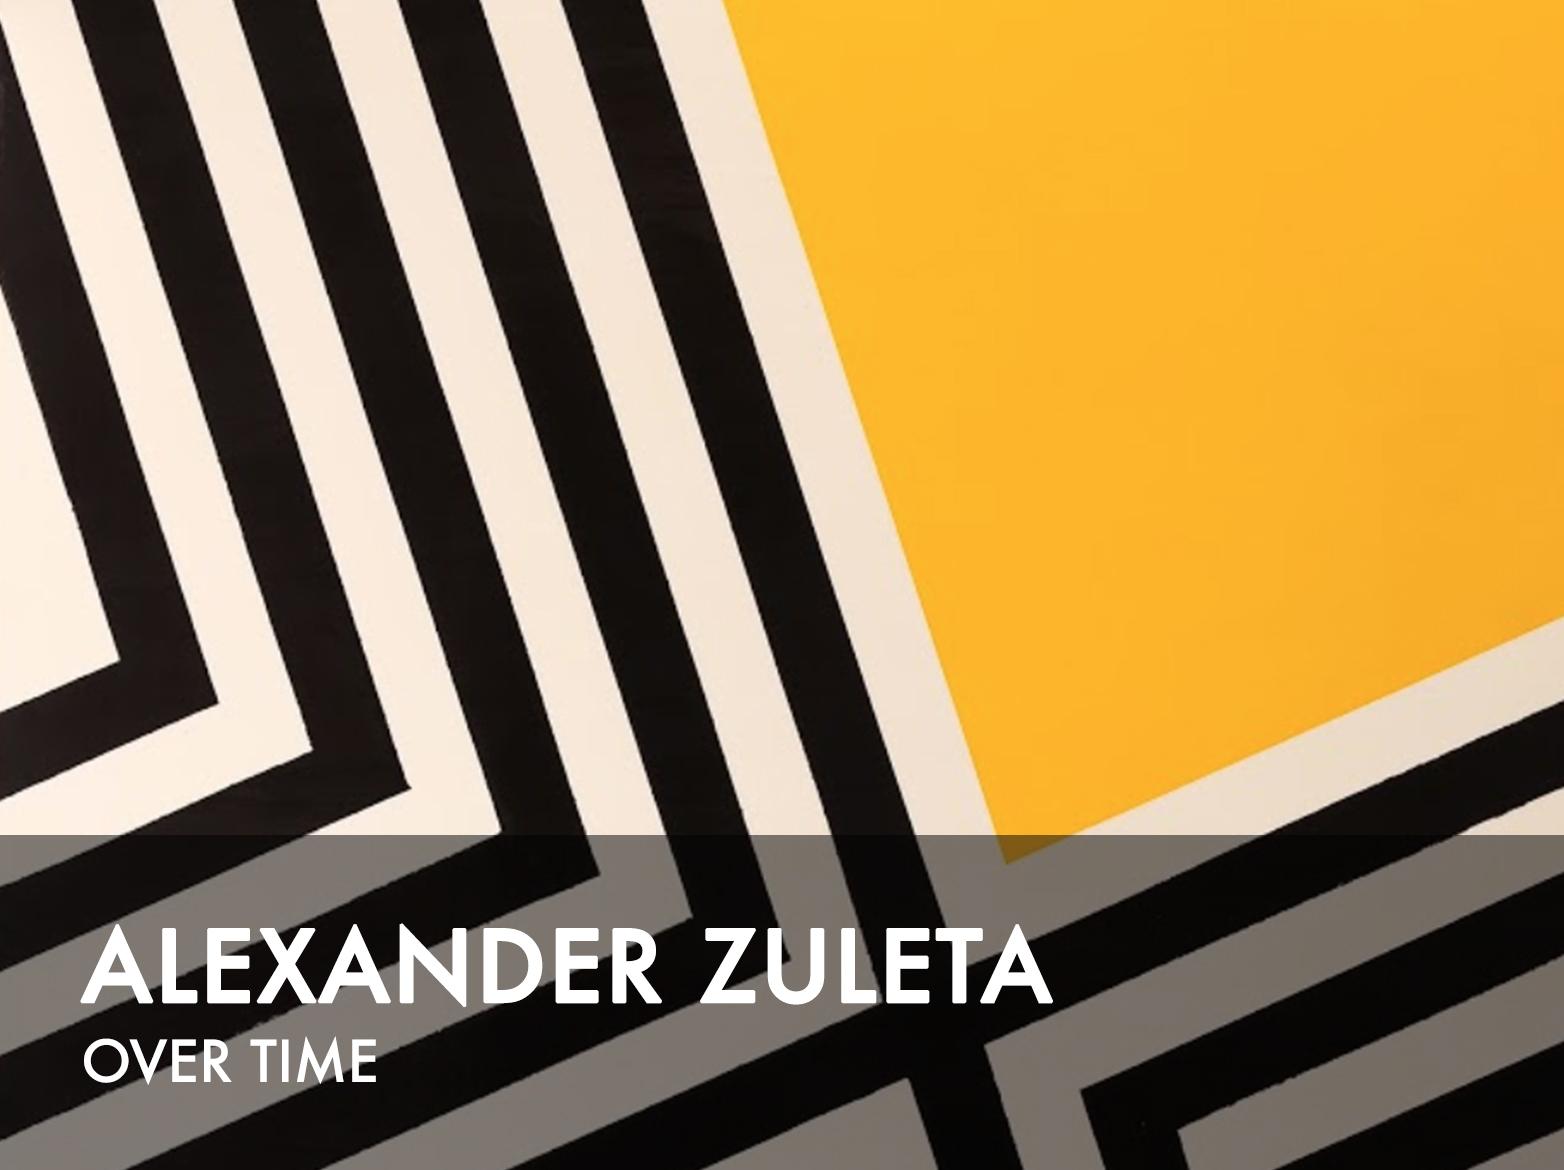 alexander_zuleta_over_time